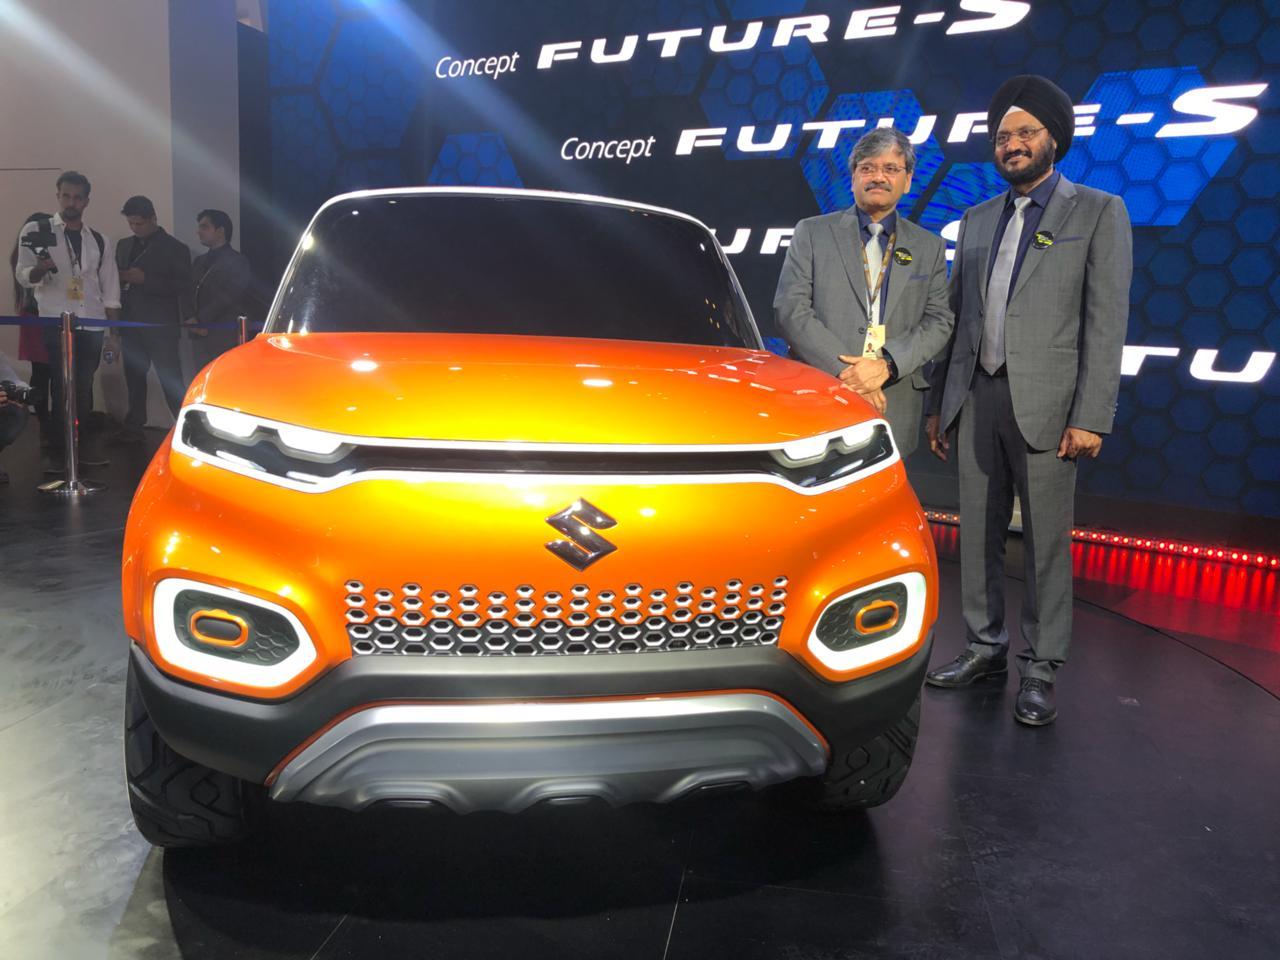 Auto Expo 2018: EVs, concepts dominate